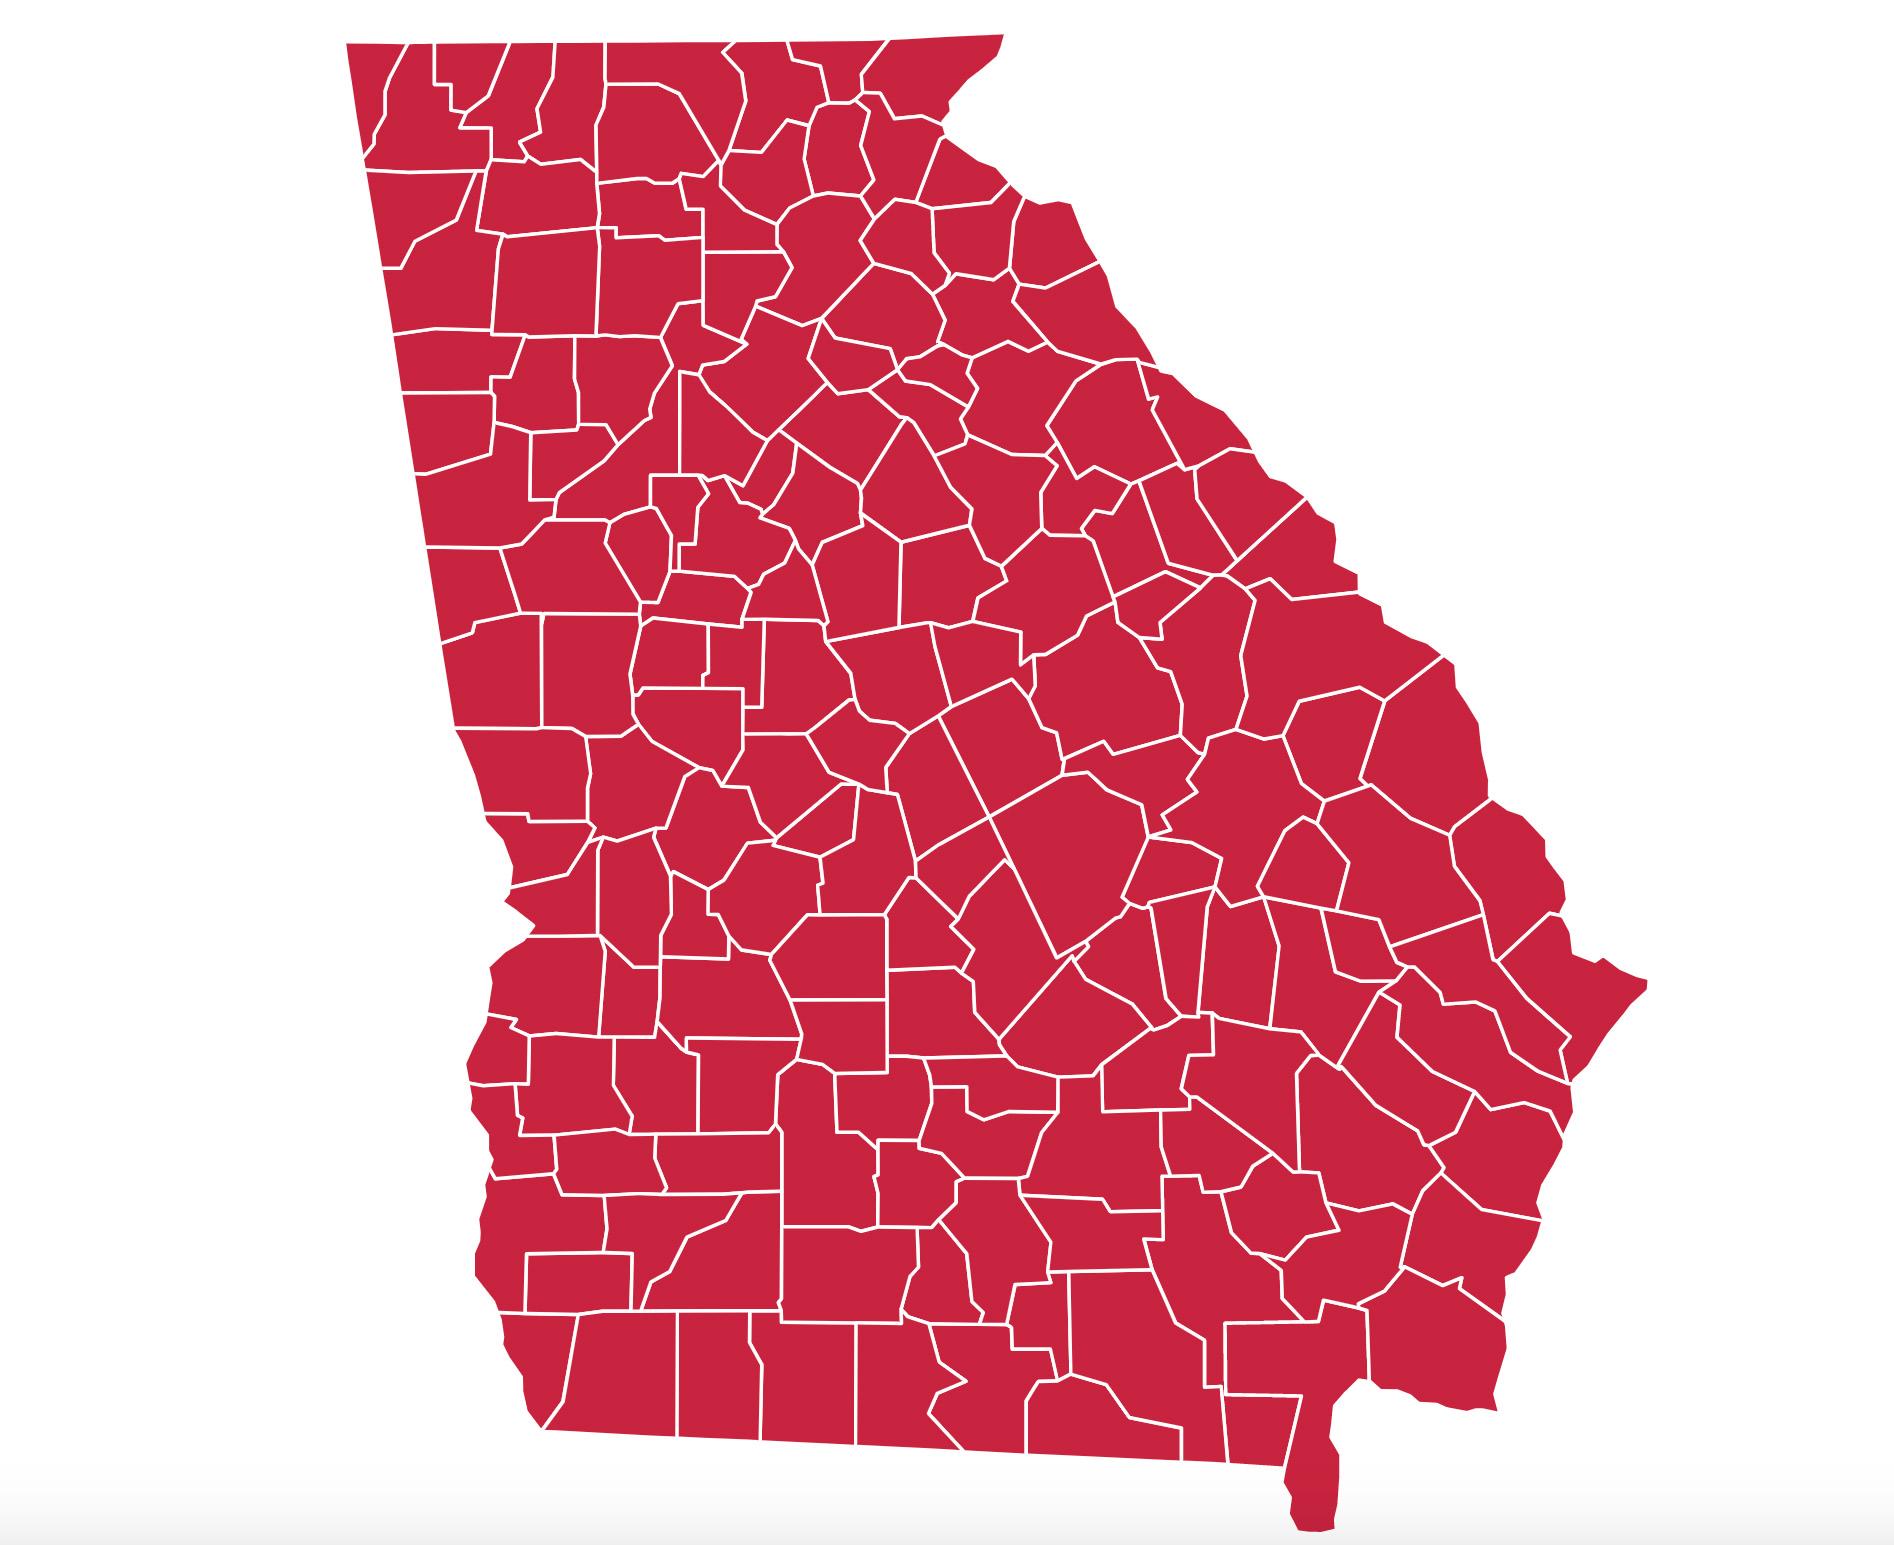 159 Georgia Counties Served